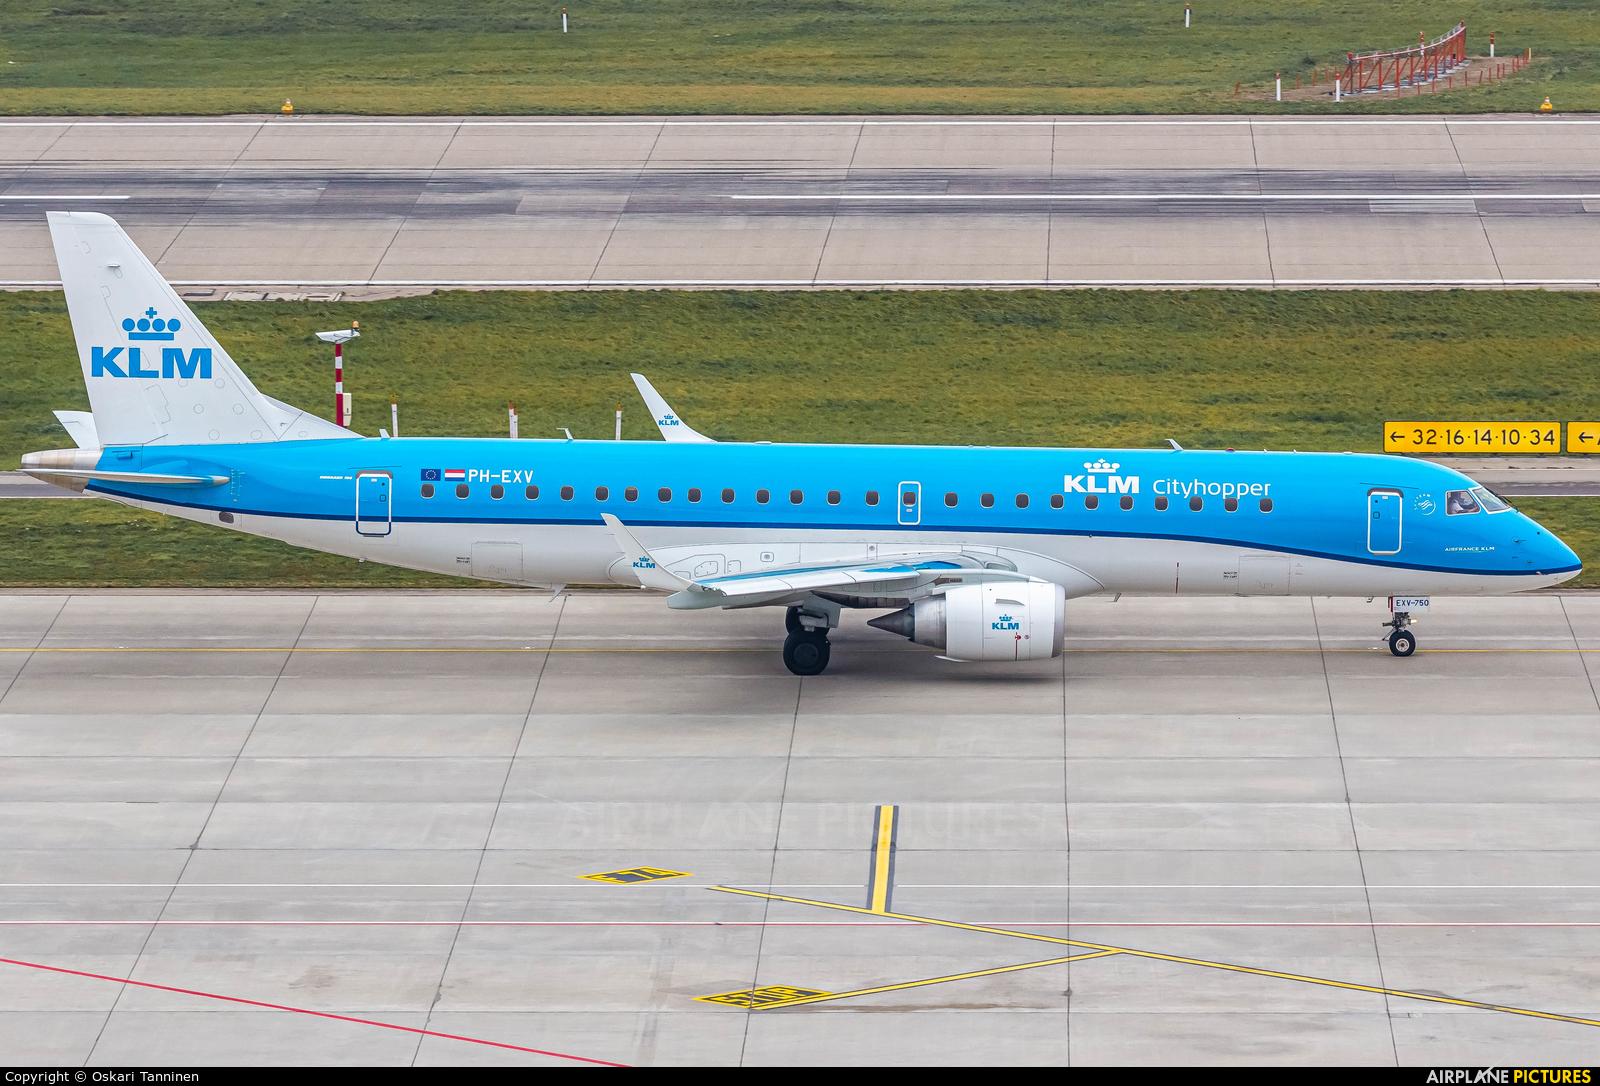 KLM Cityhopper PH-EXV aircraft at Zurich